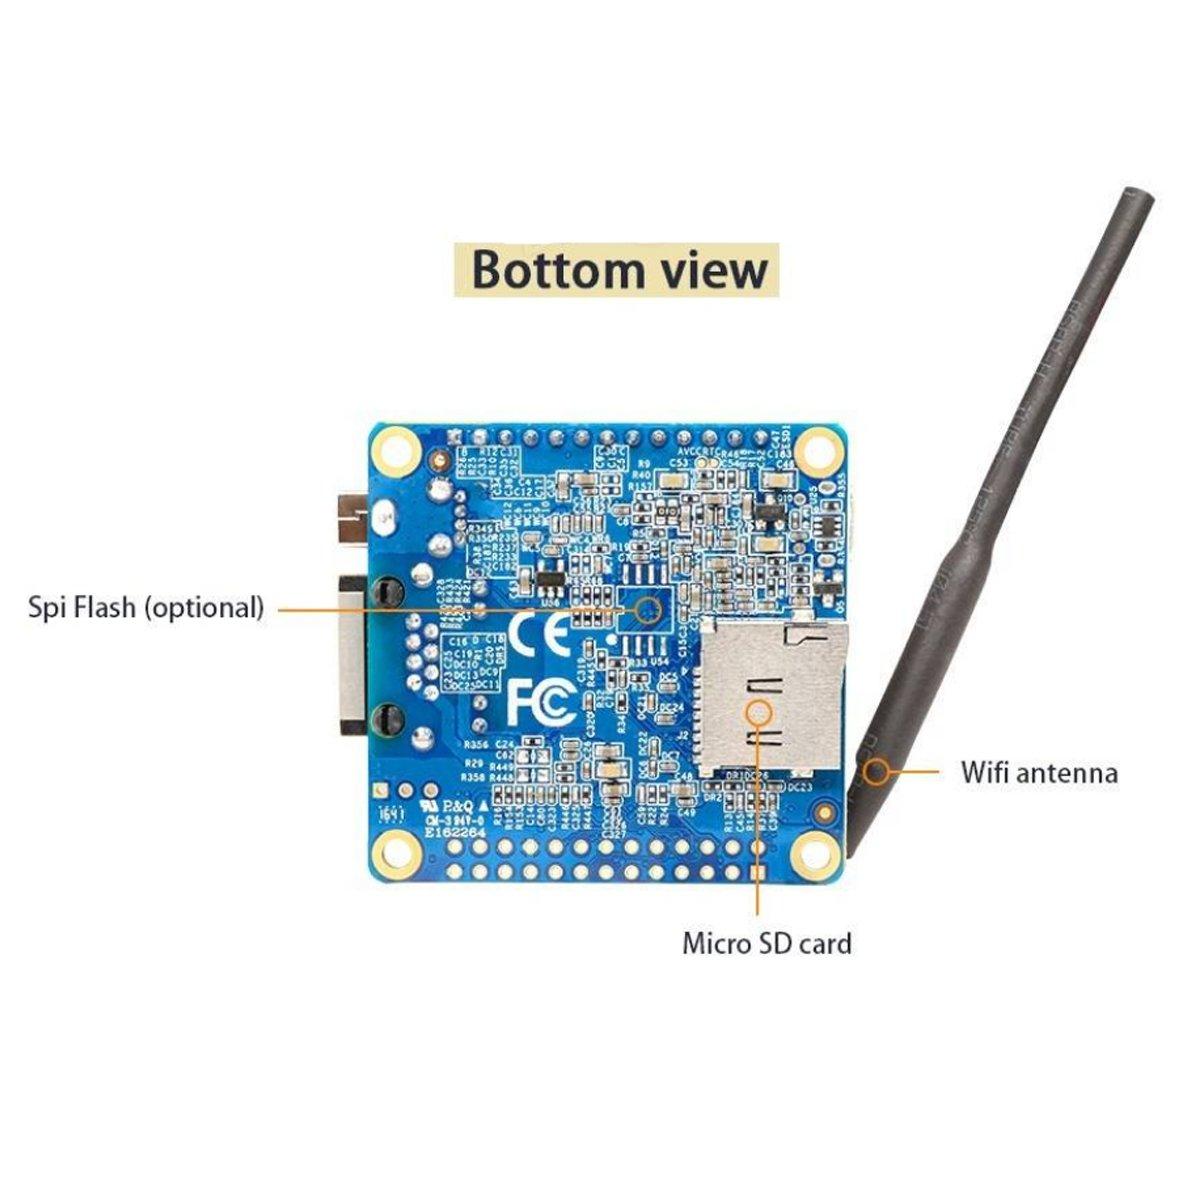 Makerfocus Orange Pi Zero H2 Quad Core Open-source 256MB Development Board with Wifi Antenna by MakerFocus (Image #5)